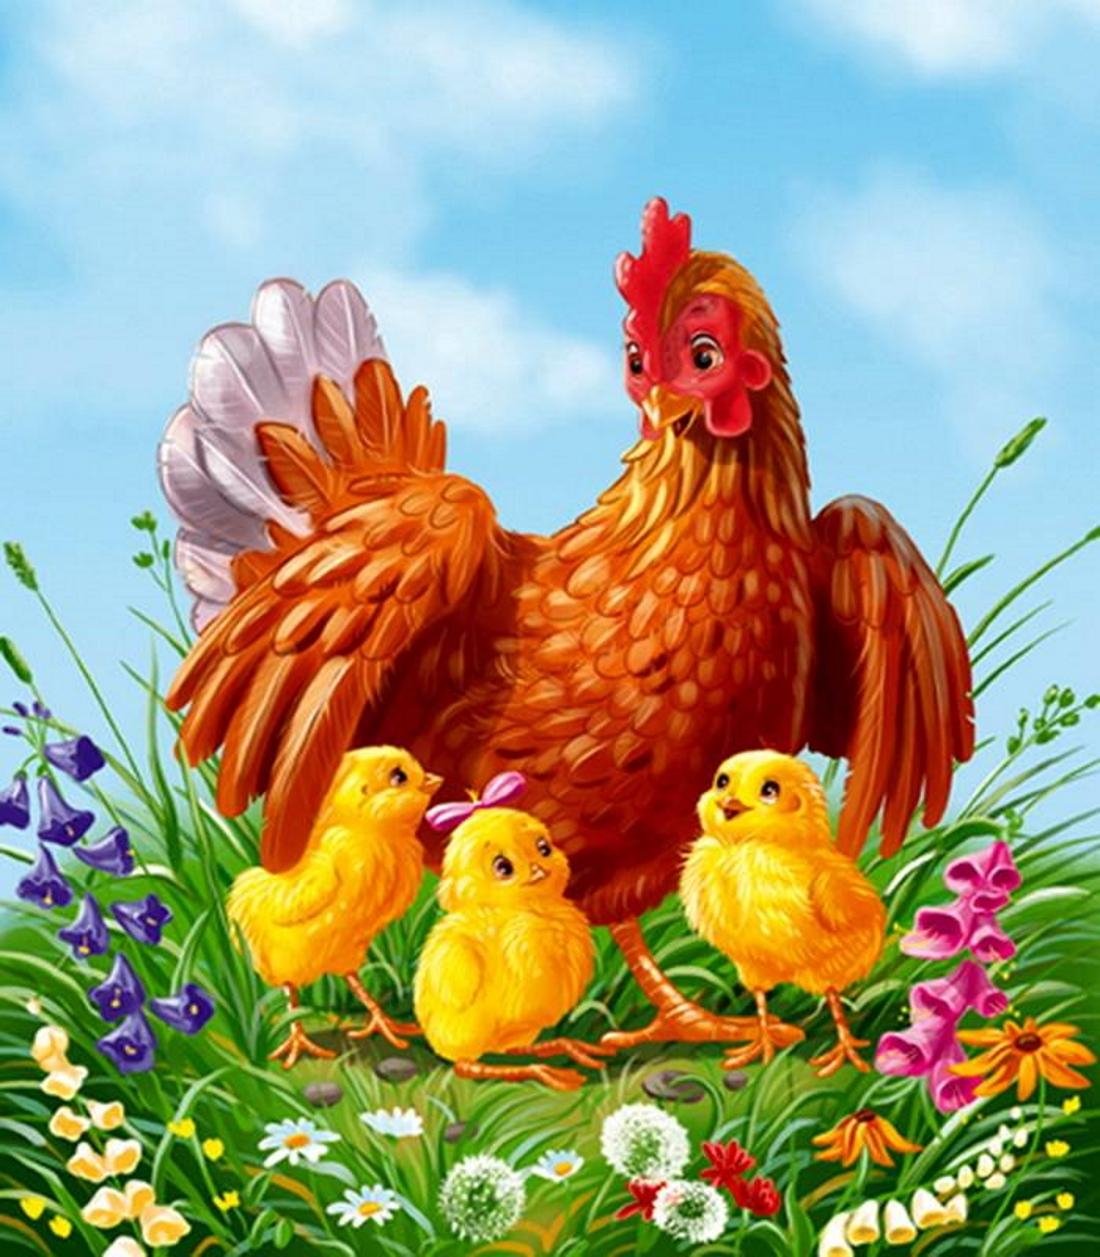 Курица с цыплятами картинки мультяшные